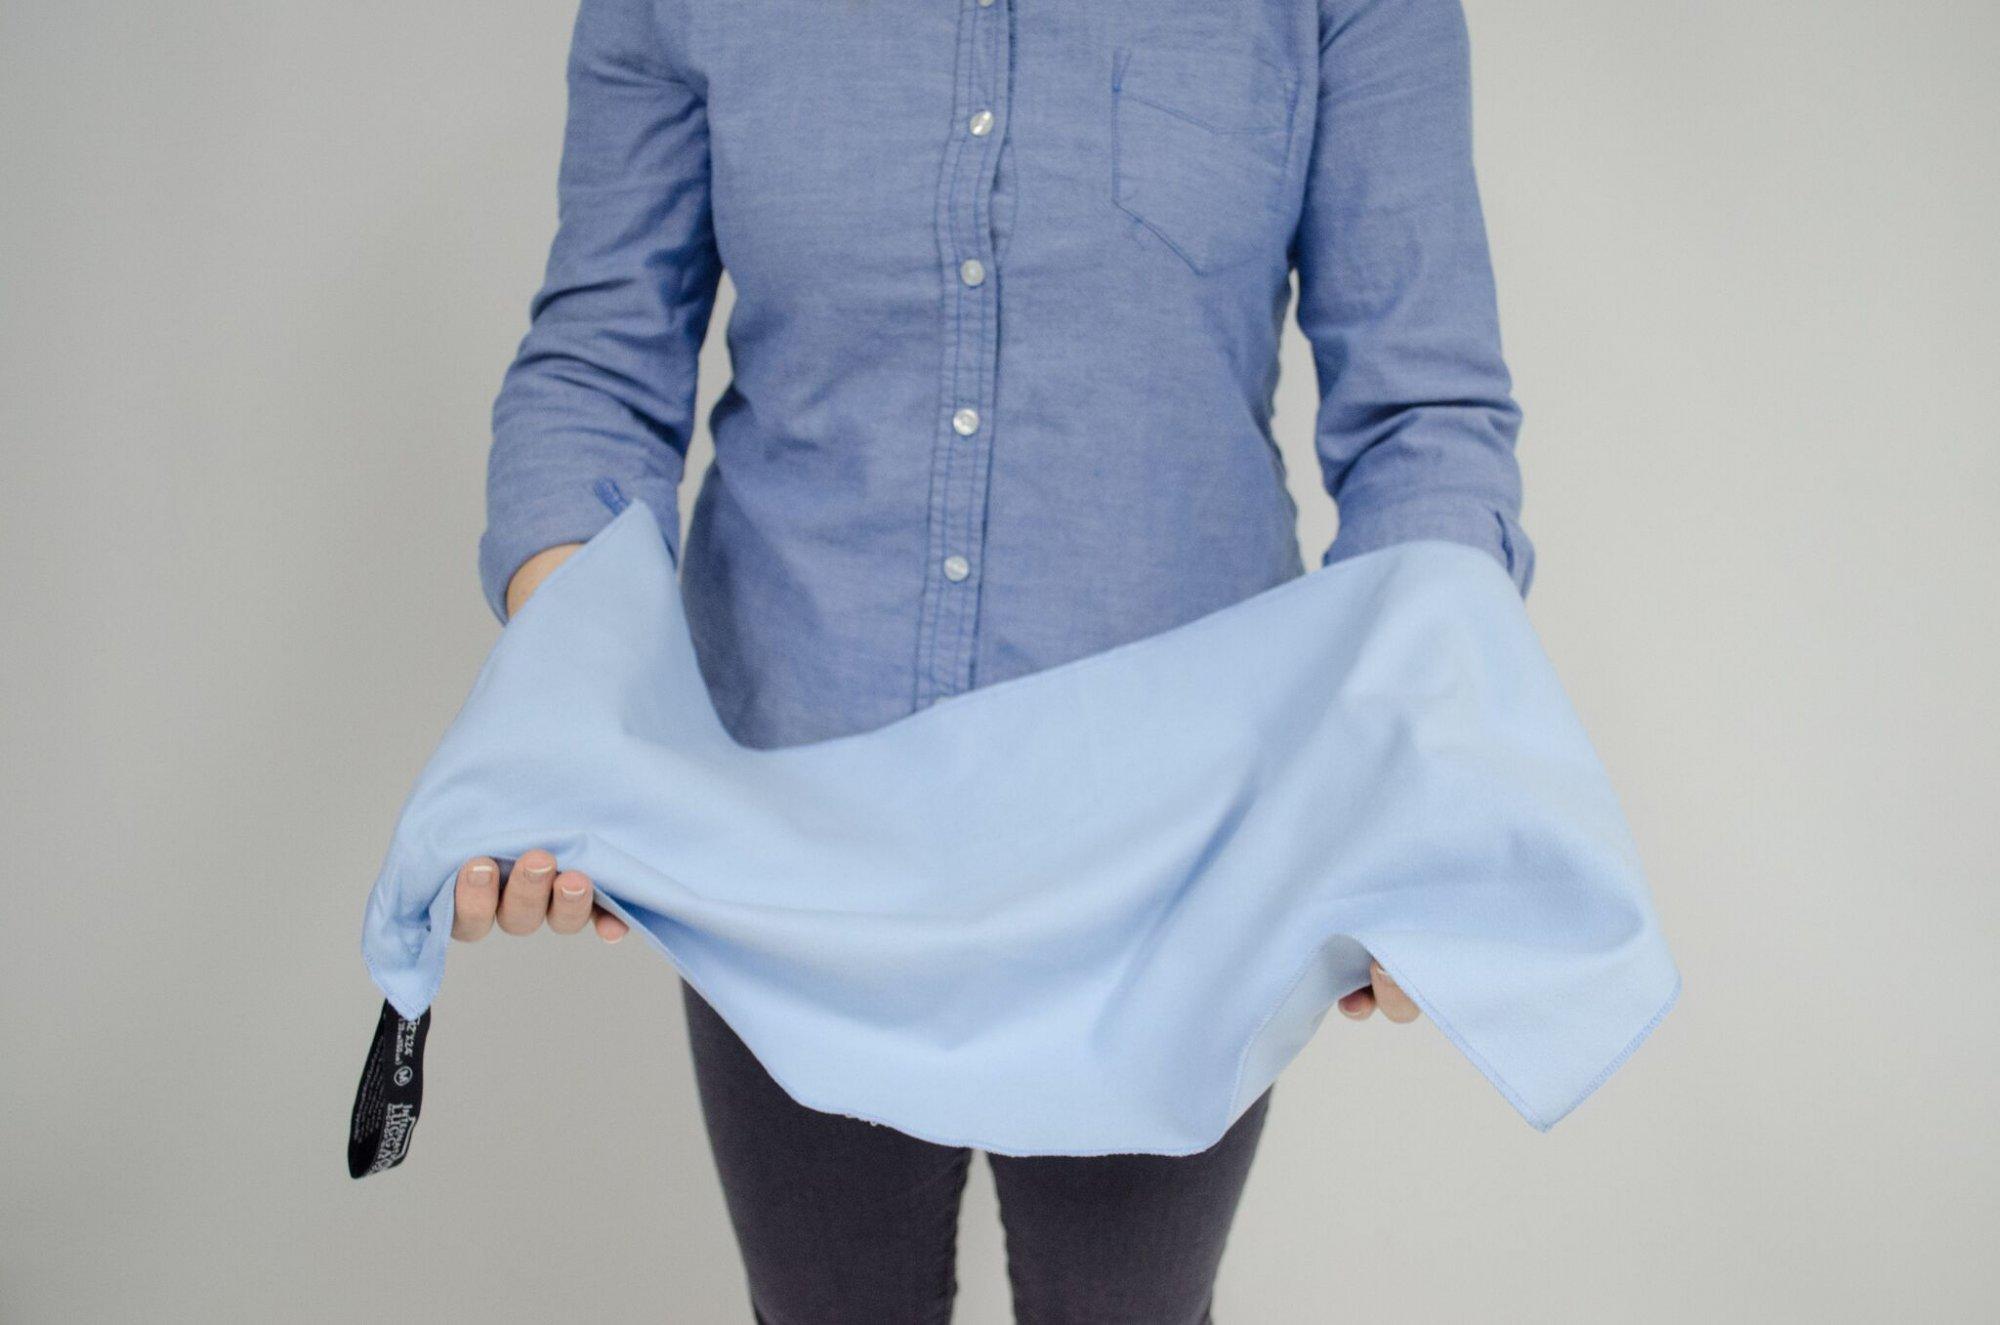 Microfiber Hand Towel Tan 12x24 International Luggage Collection MF24TN